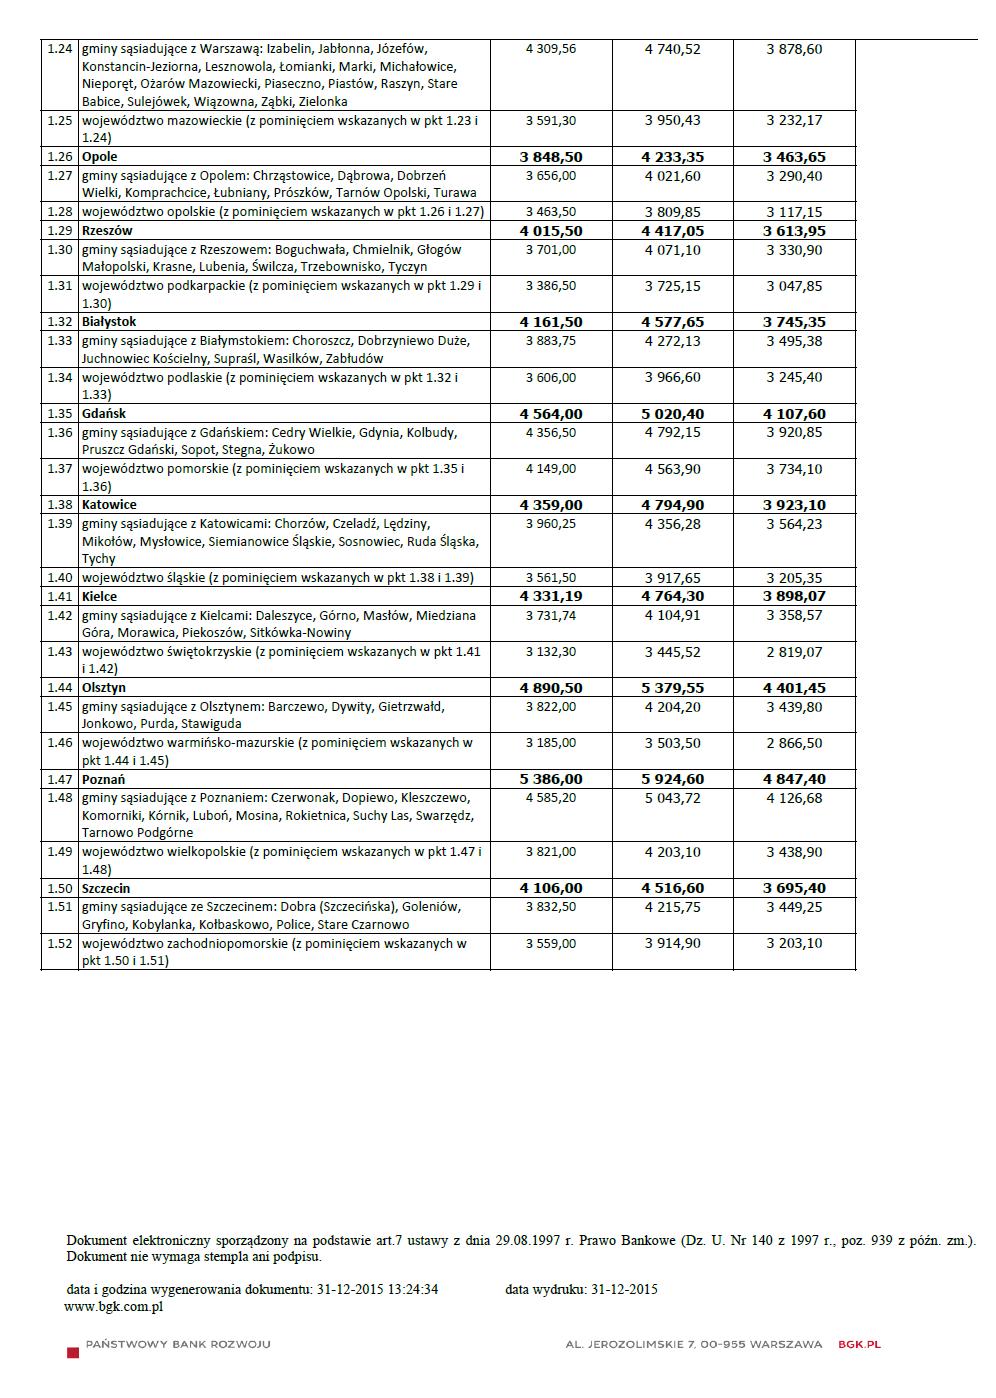 Wskaźniki i limity MdM I Q 2016 a